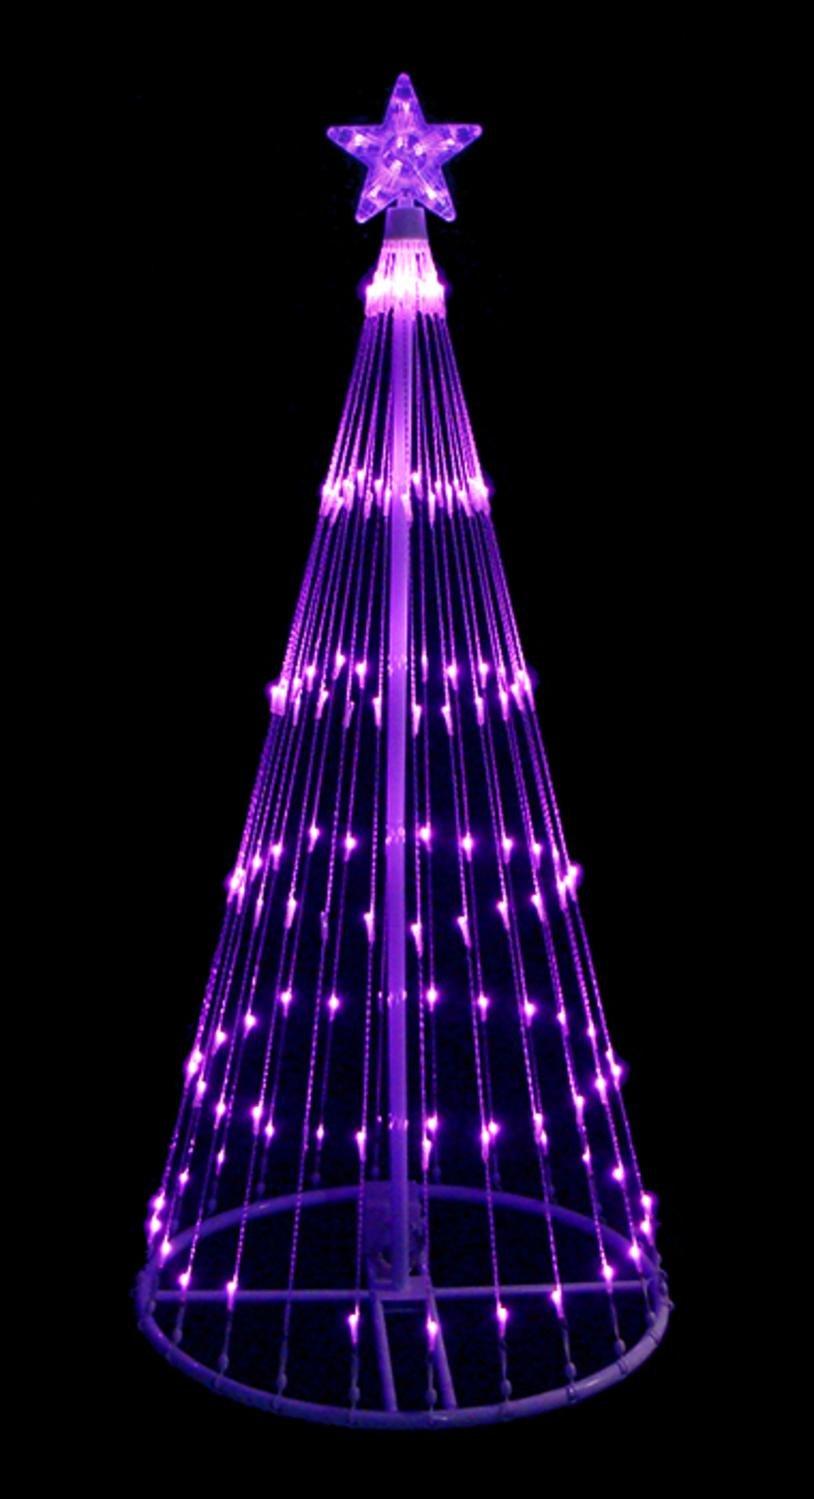 Superior Amazon.com : 4u0027 Purple LED Light Show Cone Christmas Tree Lighted Yard Art  Decoration : Garden U0026 Outdoor